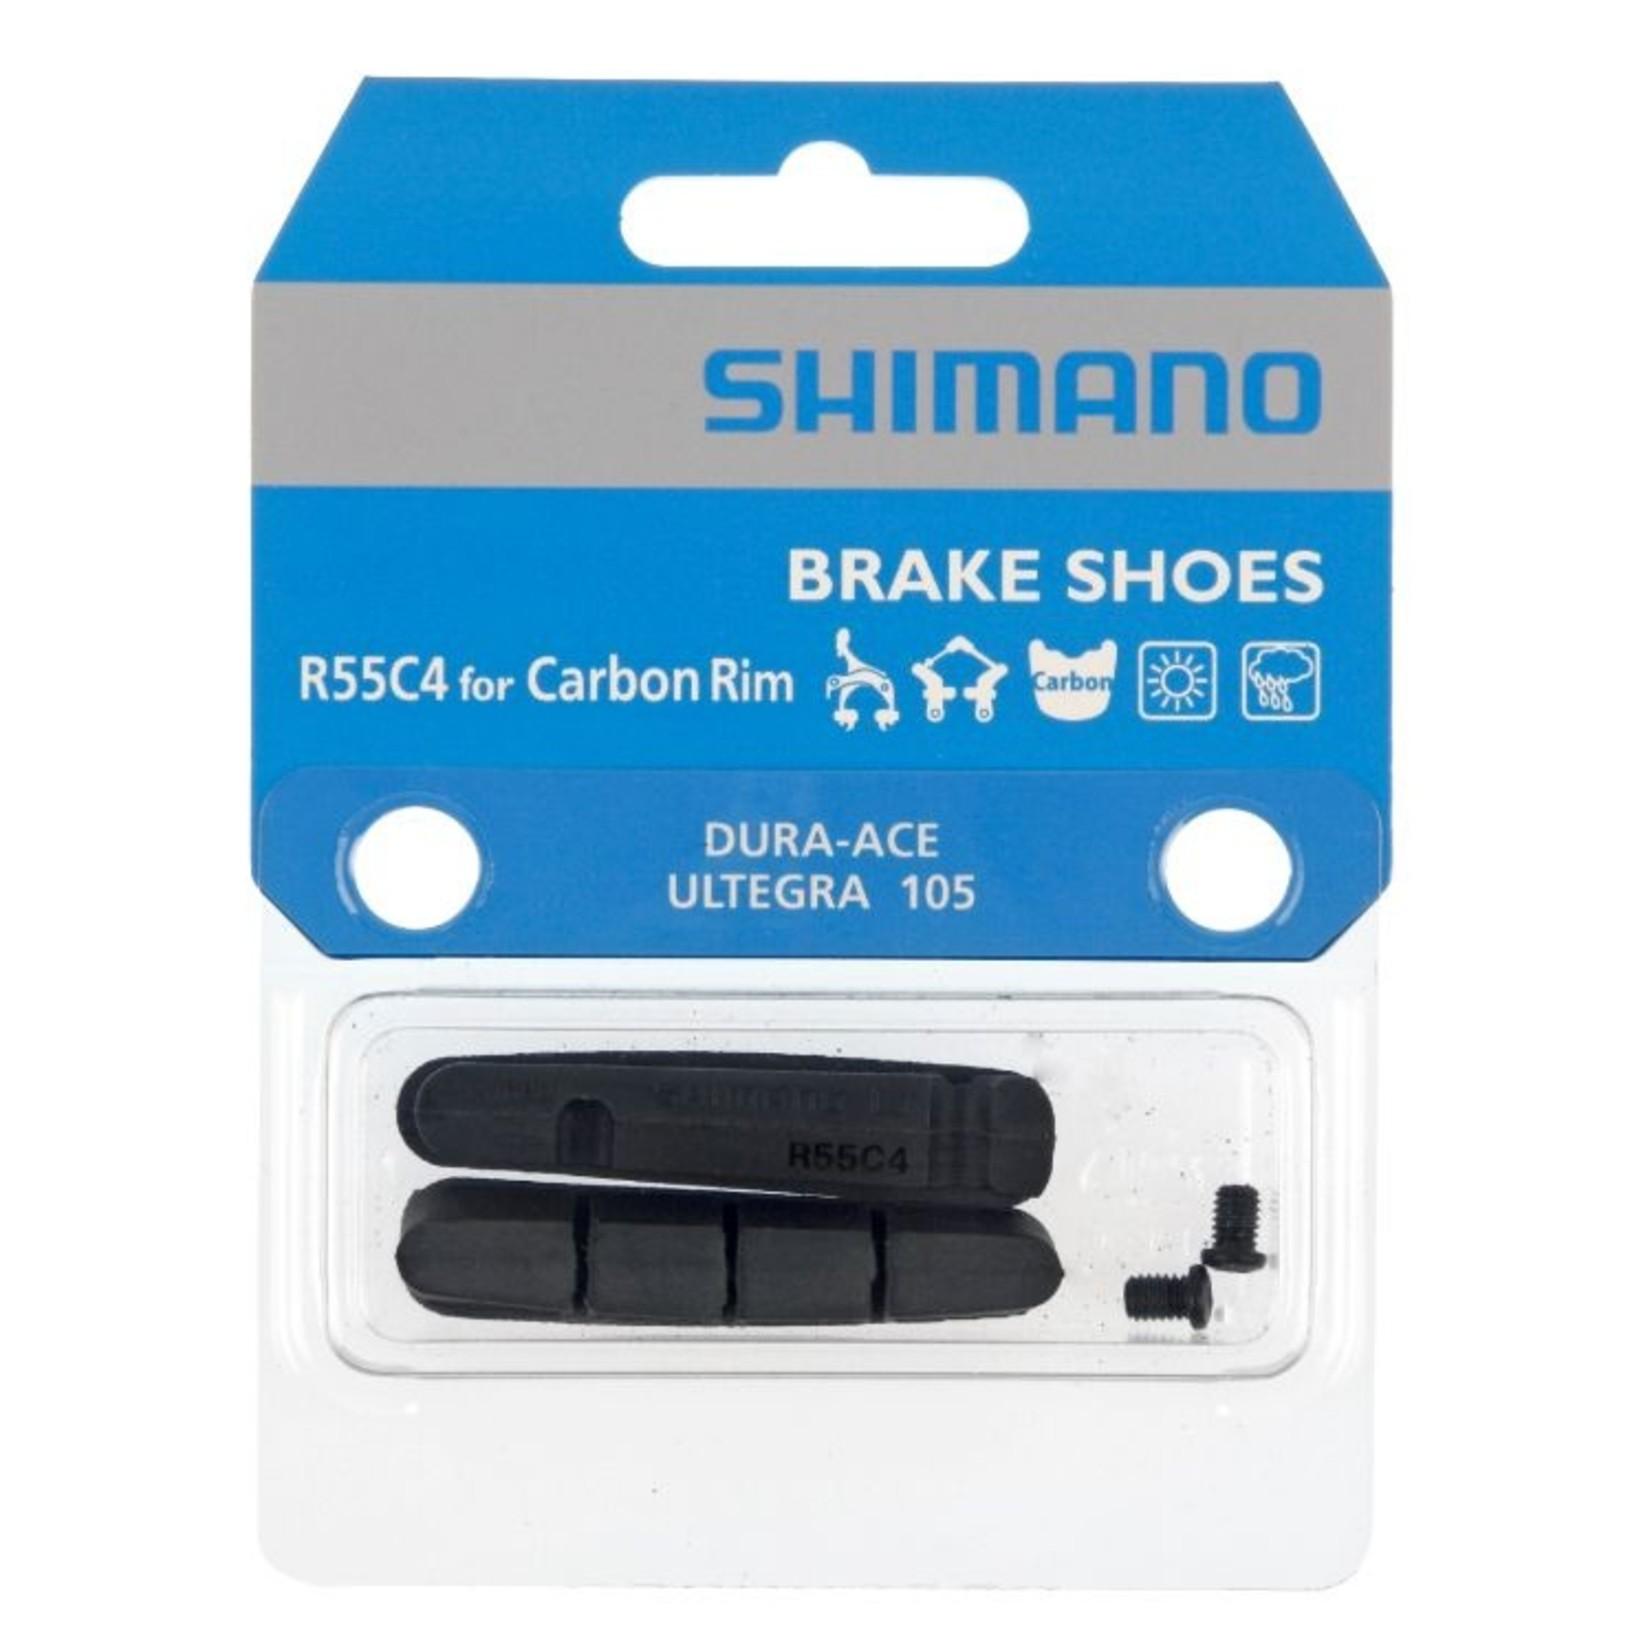 Shimano Shimano, BR-9000 Brake pad Inserts R55C4 For Carbon Rim (1 Pair)